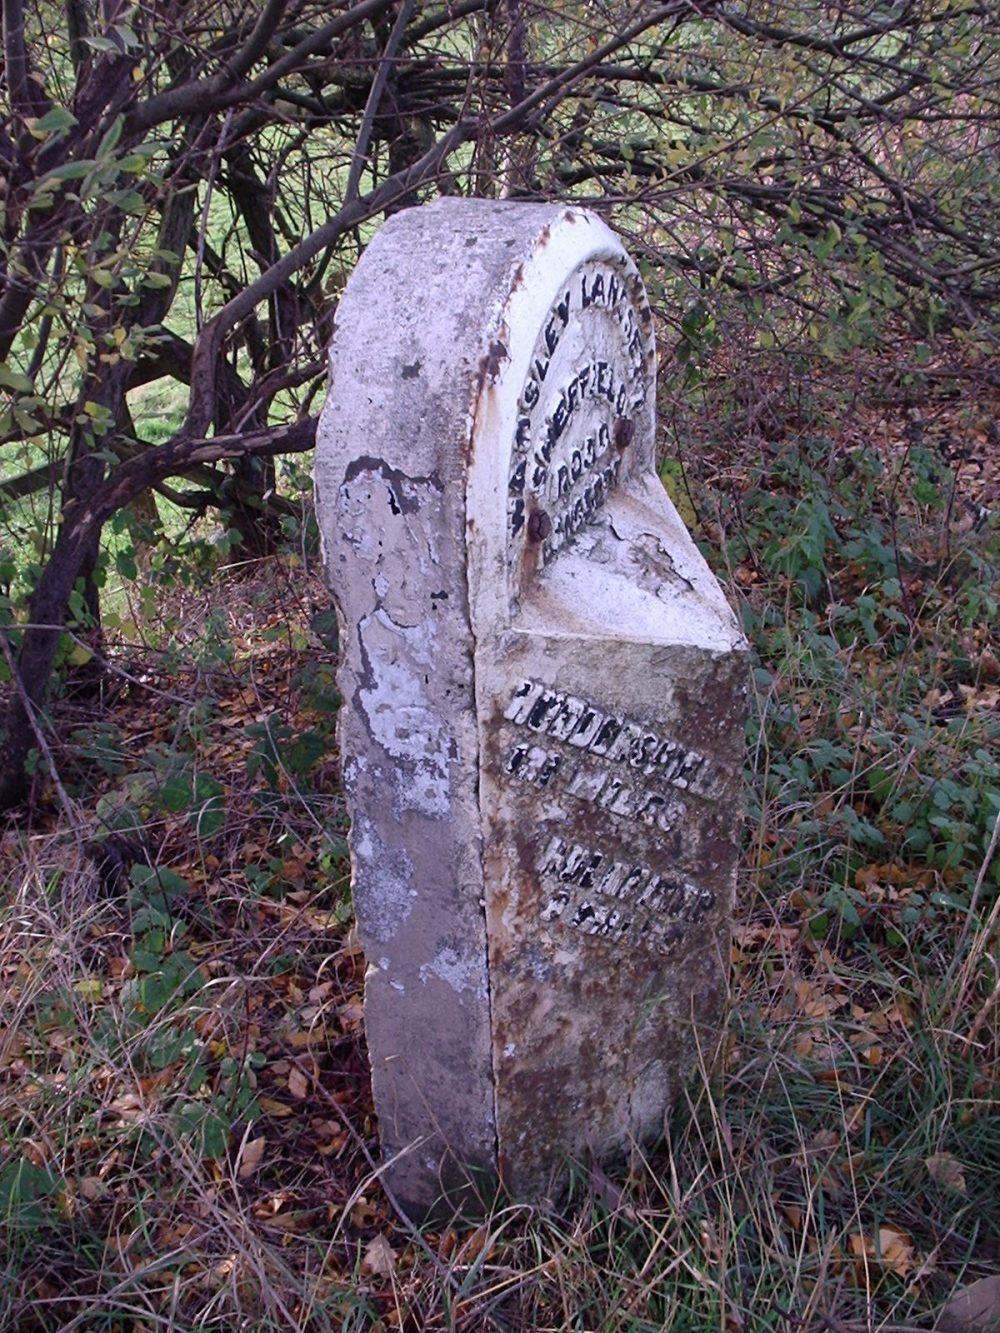 Highways England restoring historic mileposts in Yorkshire